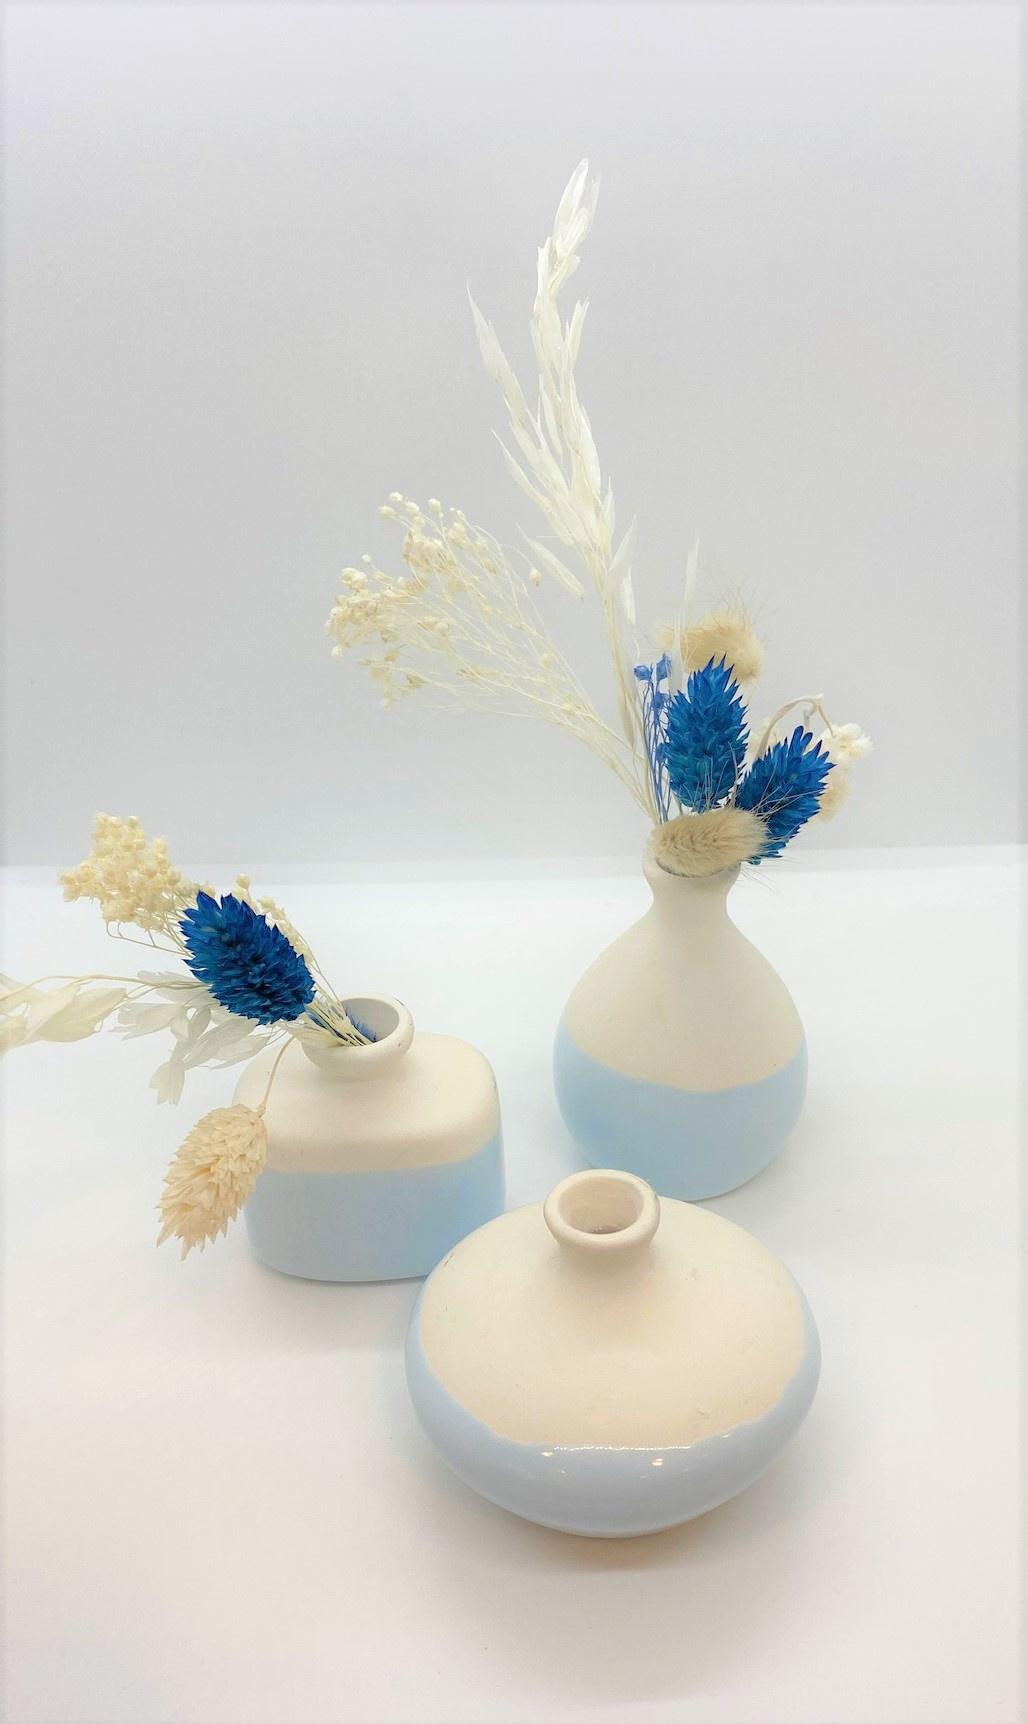 Mini Droogboeket Blauw - Atelier Olala-2